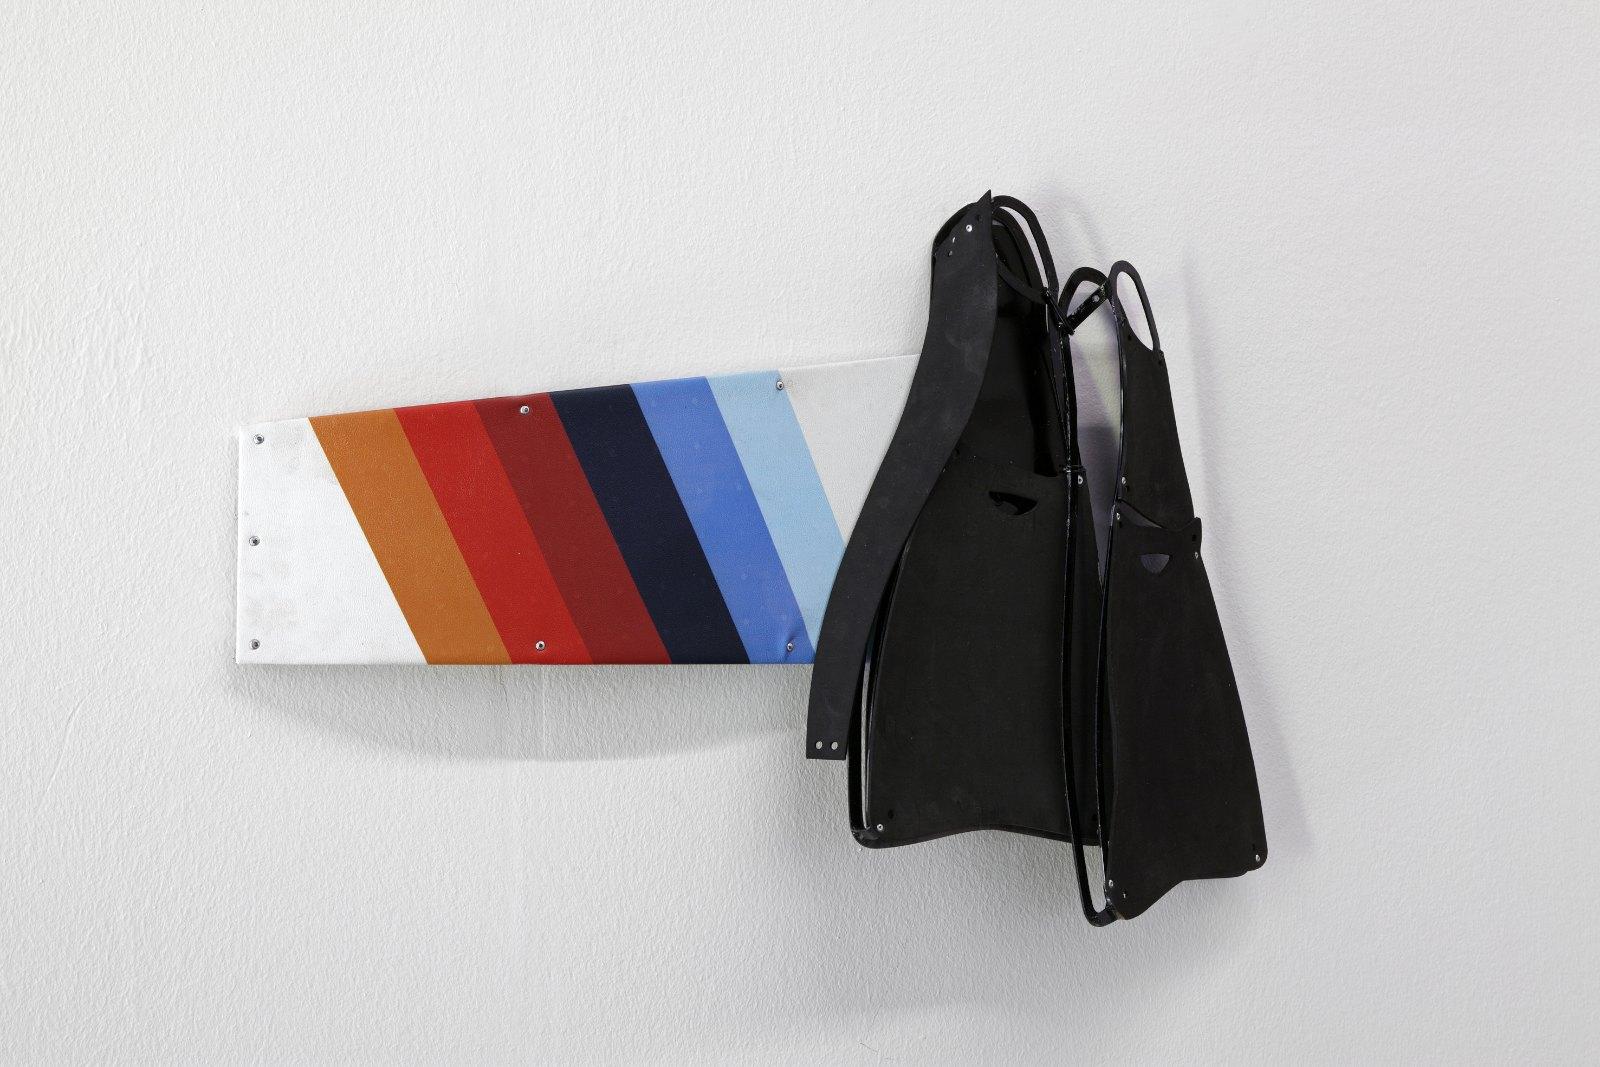 Off Shore, 2013, Iron, rubber, inkjet print on leatherette, galvanized iron, spray paint, 52 x 77 x 11 cm